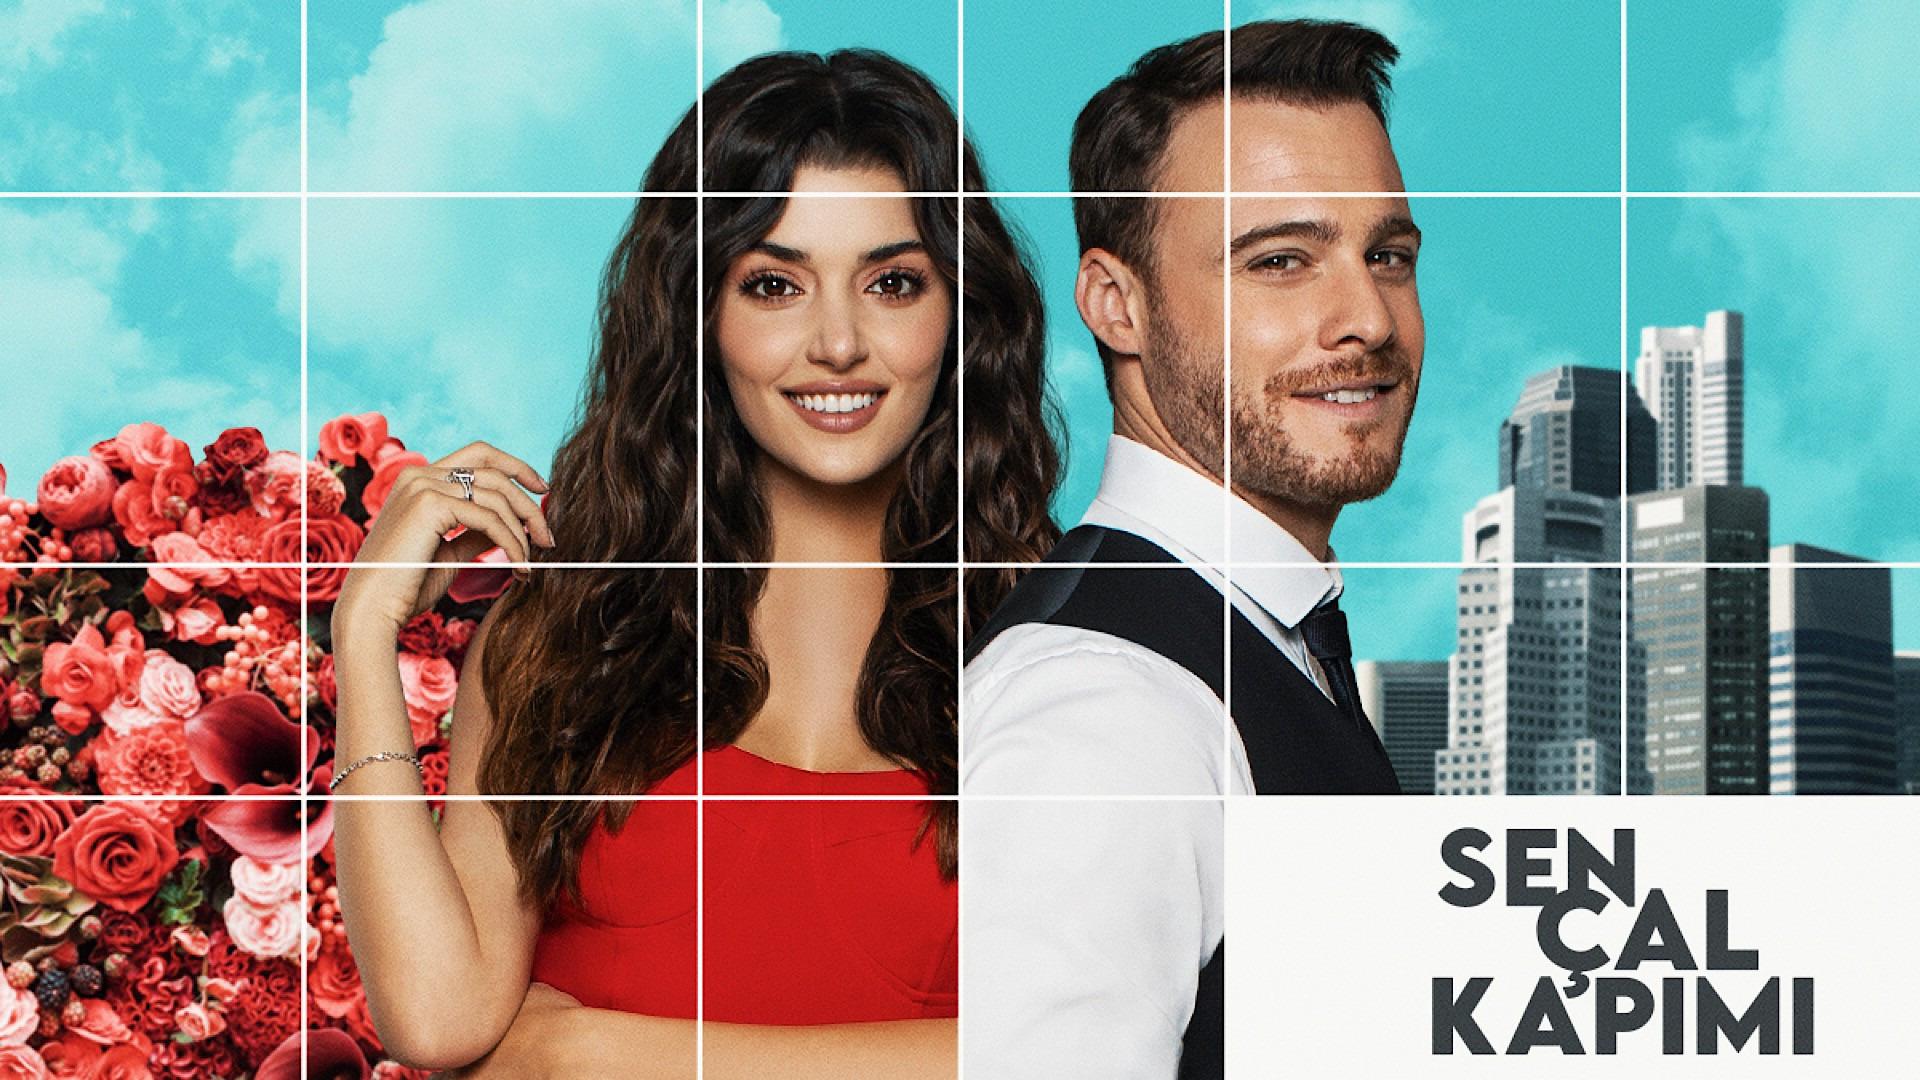 Show Sen Çal Kapımı